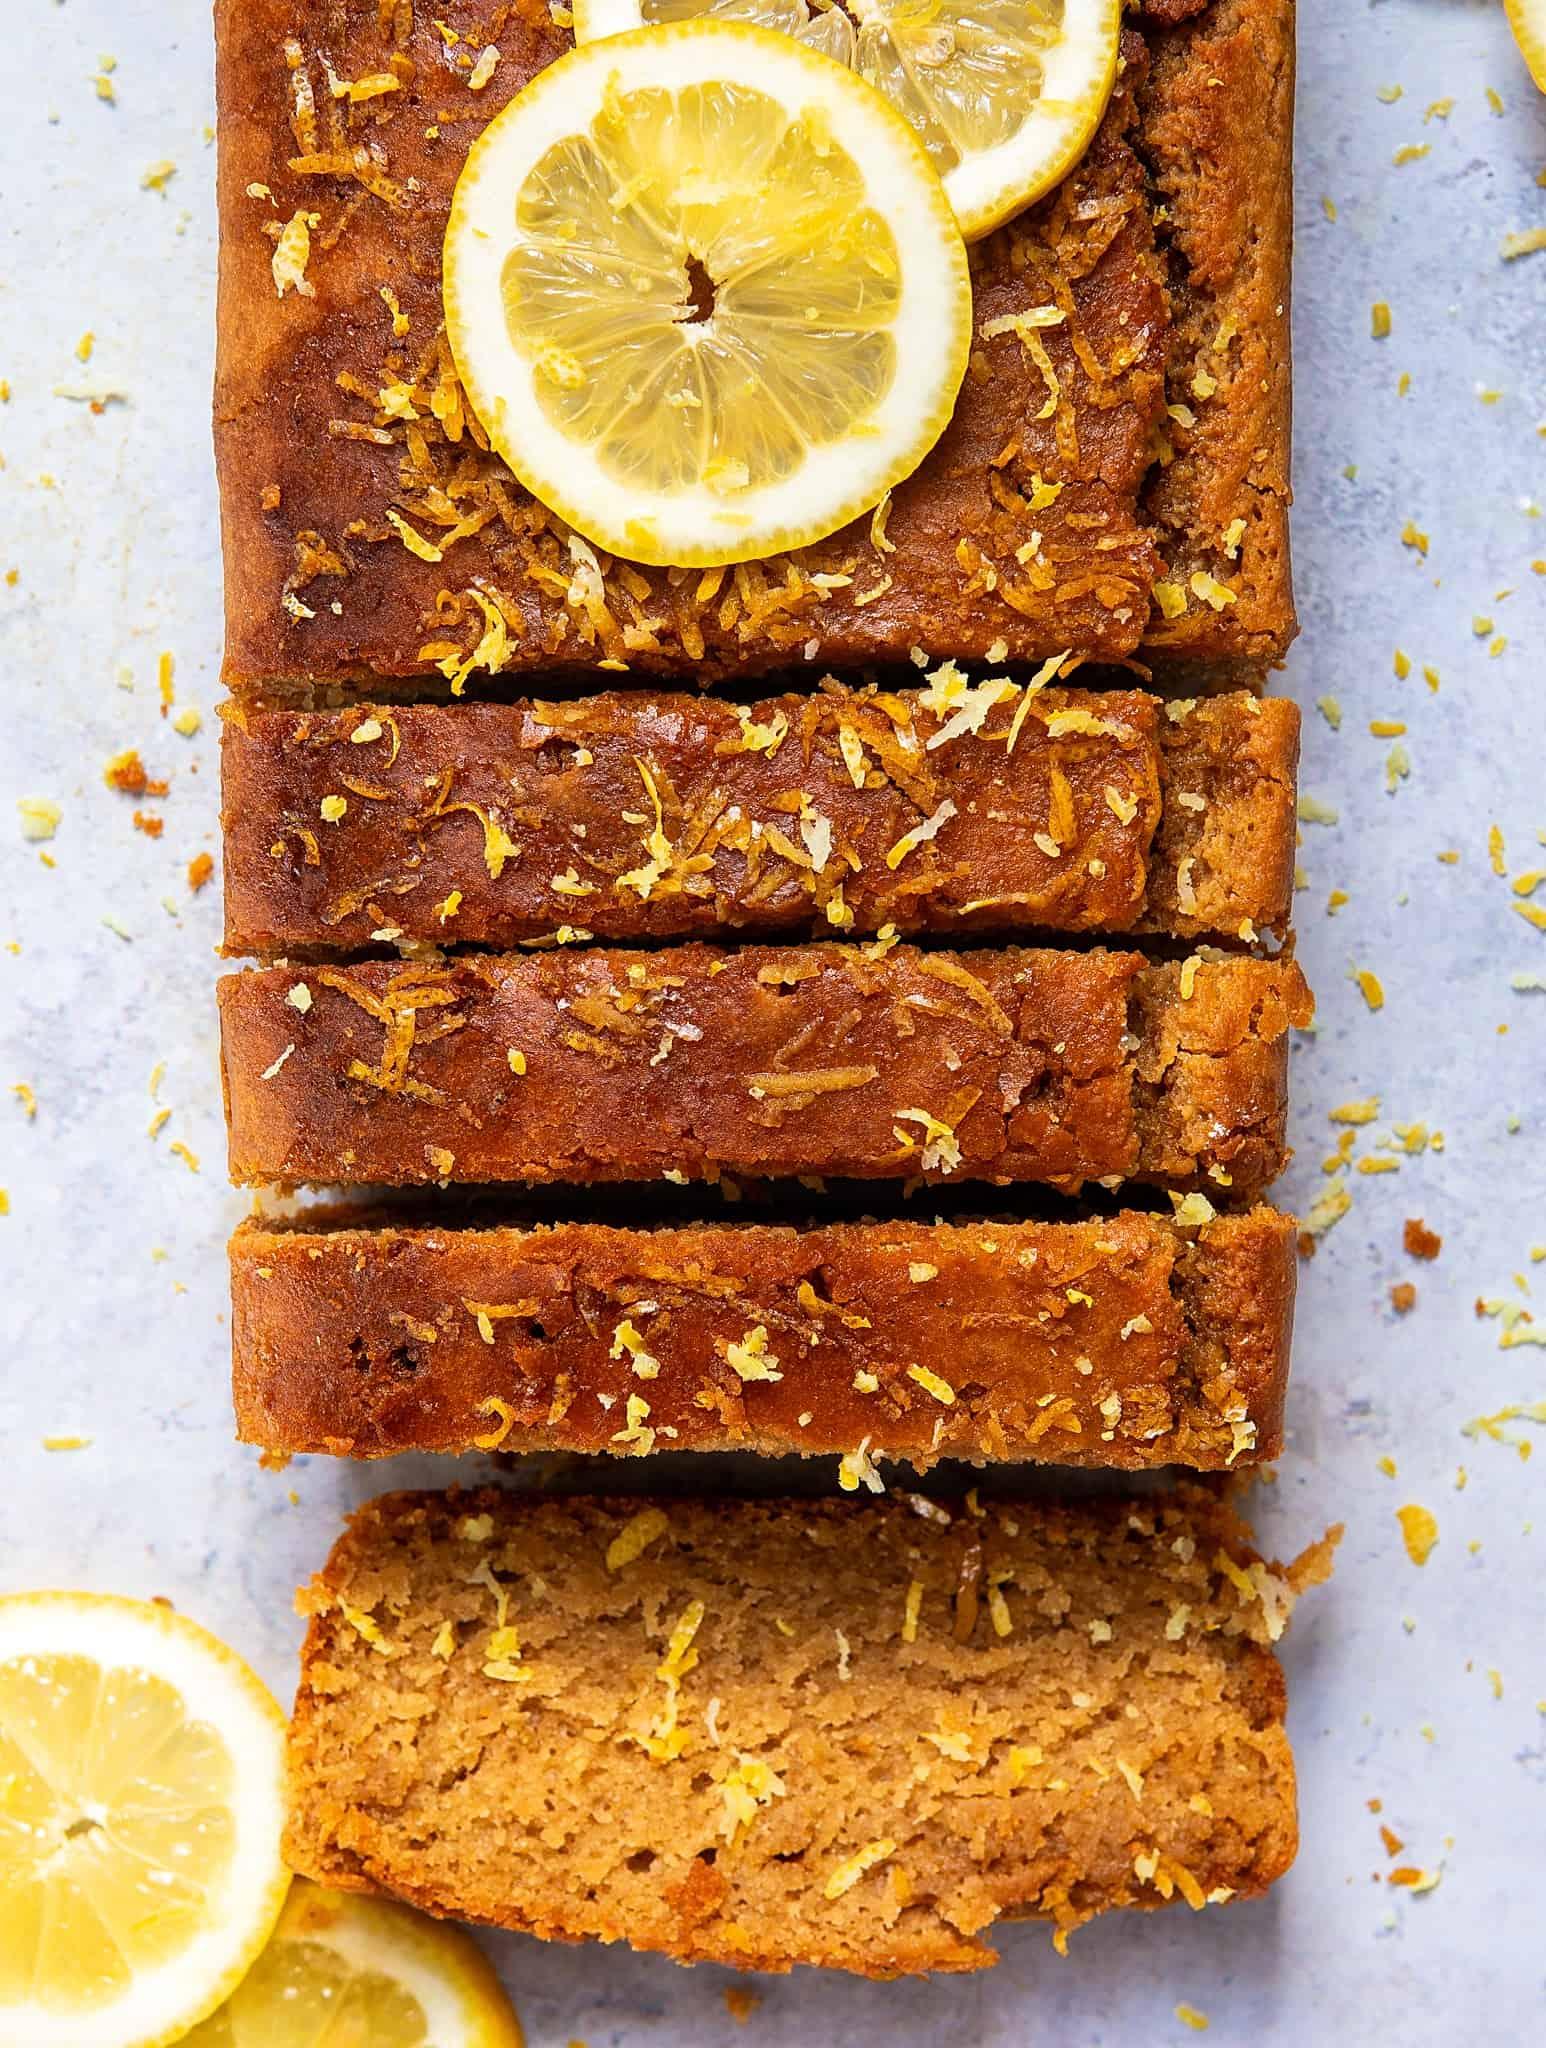 Lemon Drizzle Cake - The Best Gluten-Free Vegan Refined Sugar Free